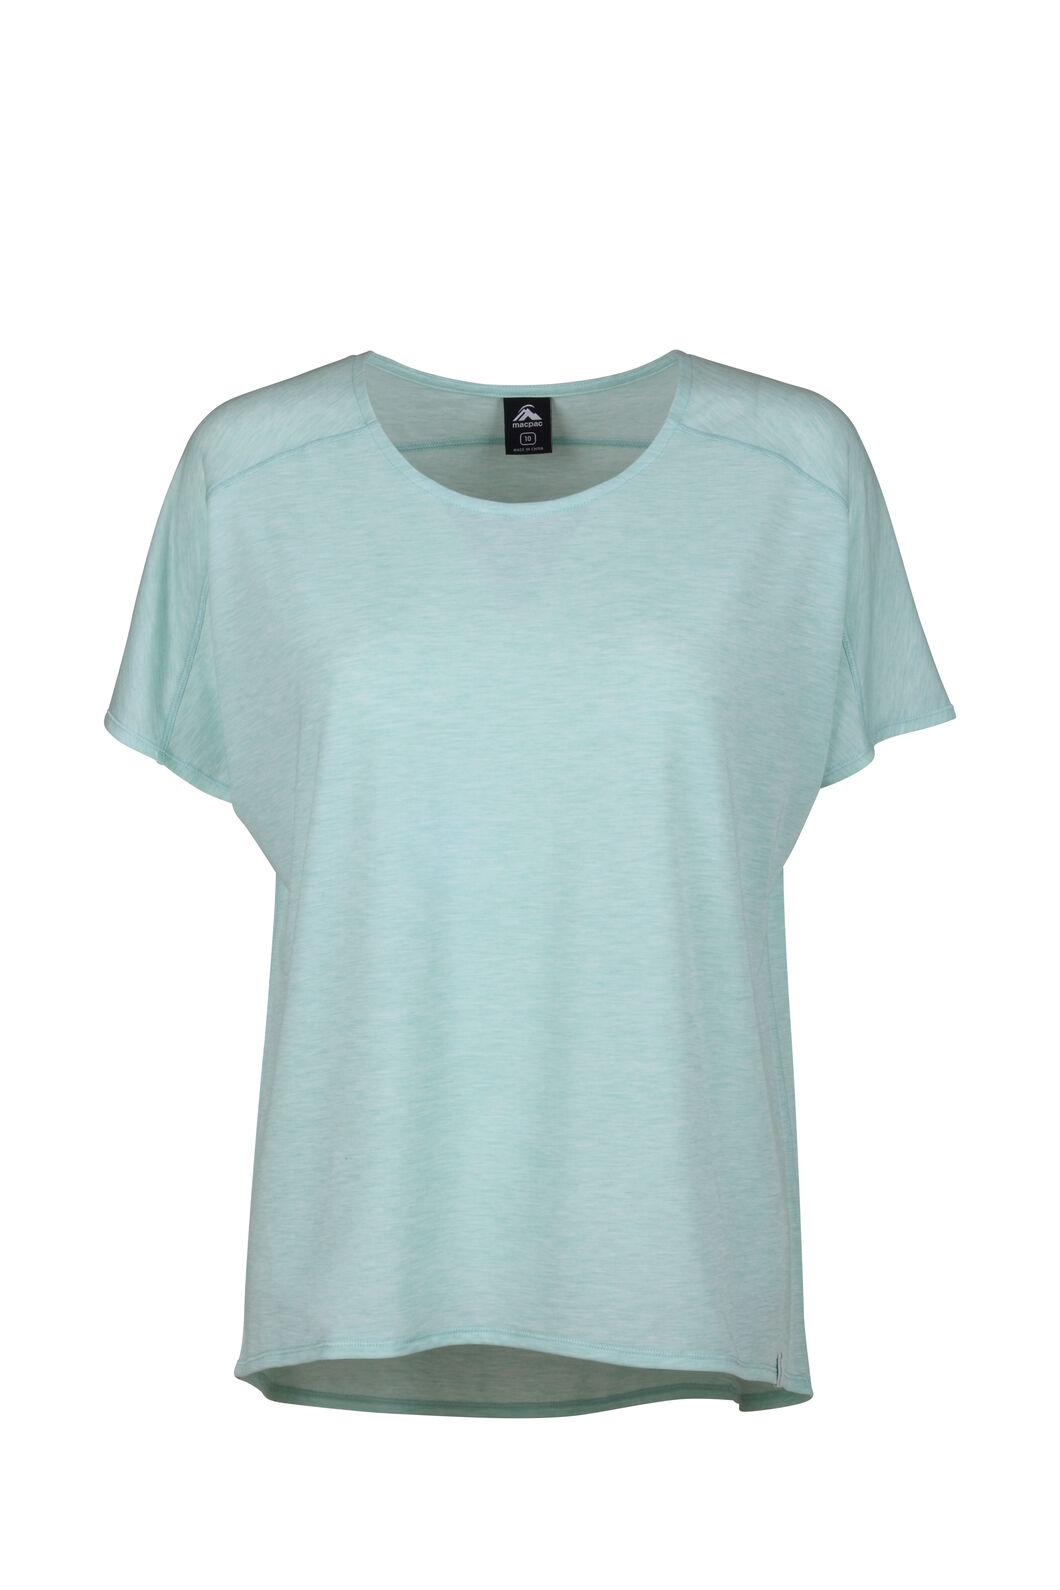 Macpac Eva Short Sleeve Tee — Women's, Canton, hi-res